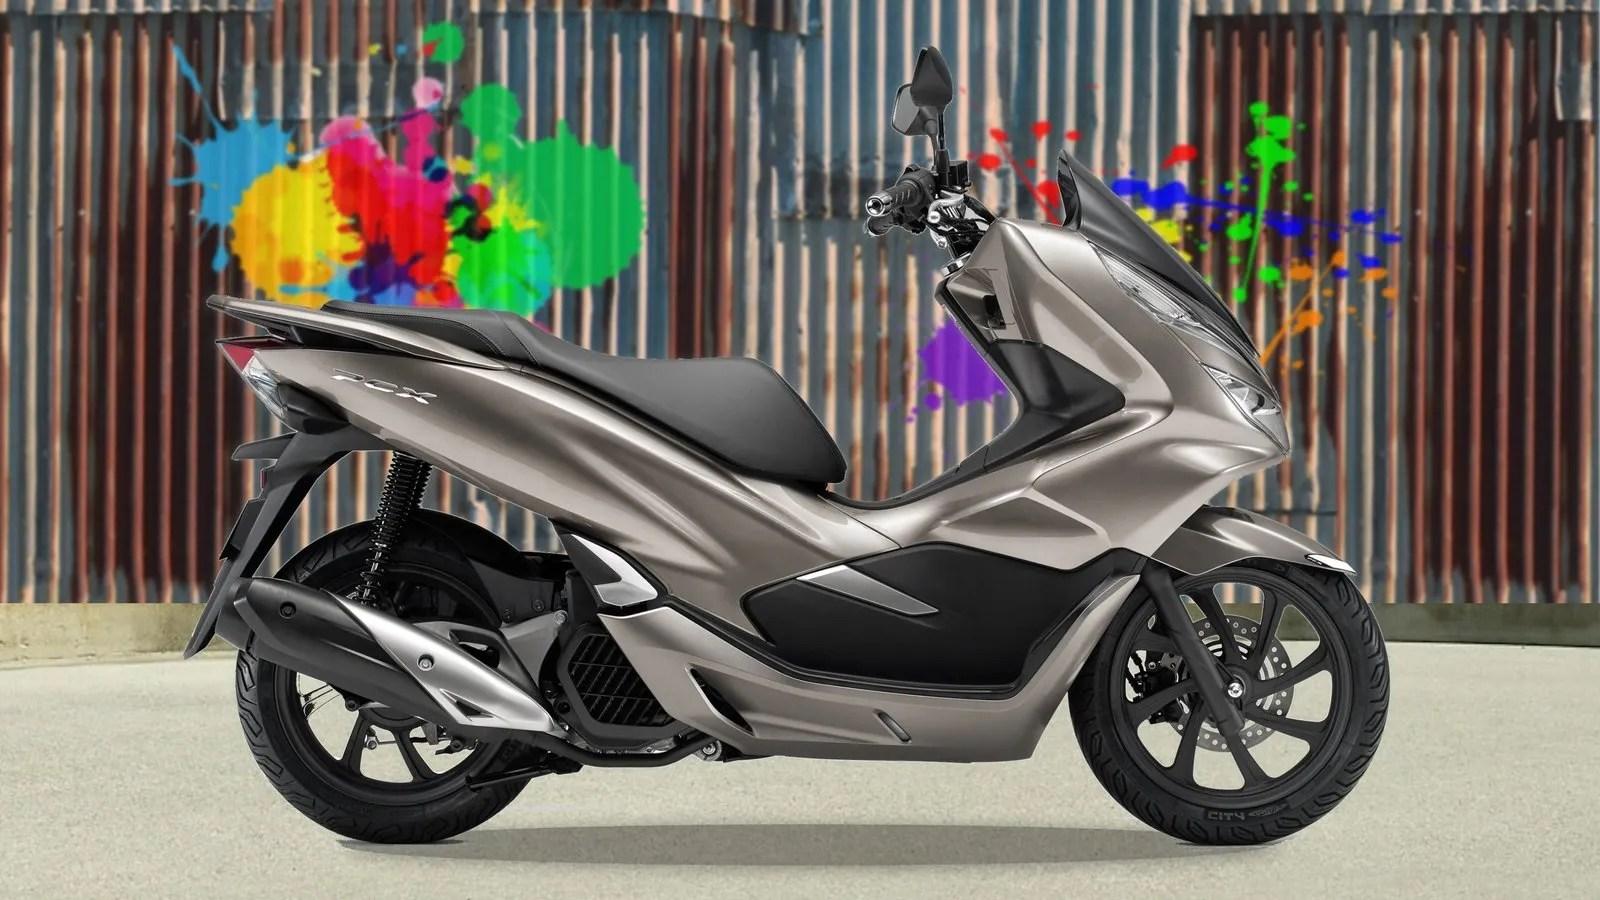 Honda List Motorcycle Price Philippines